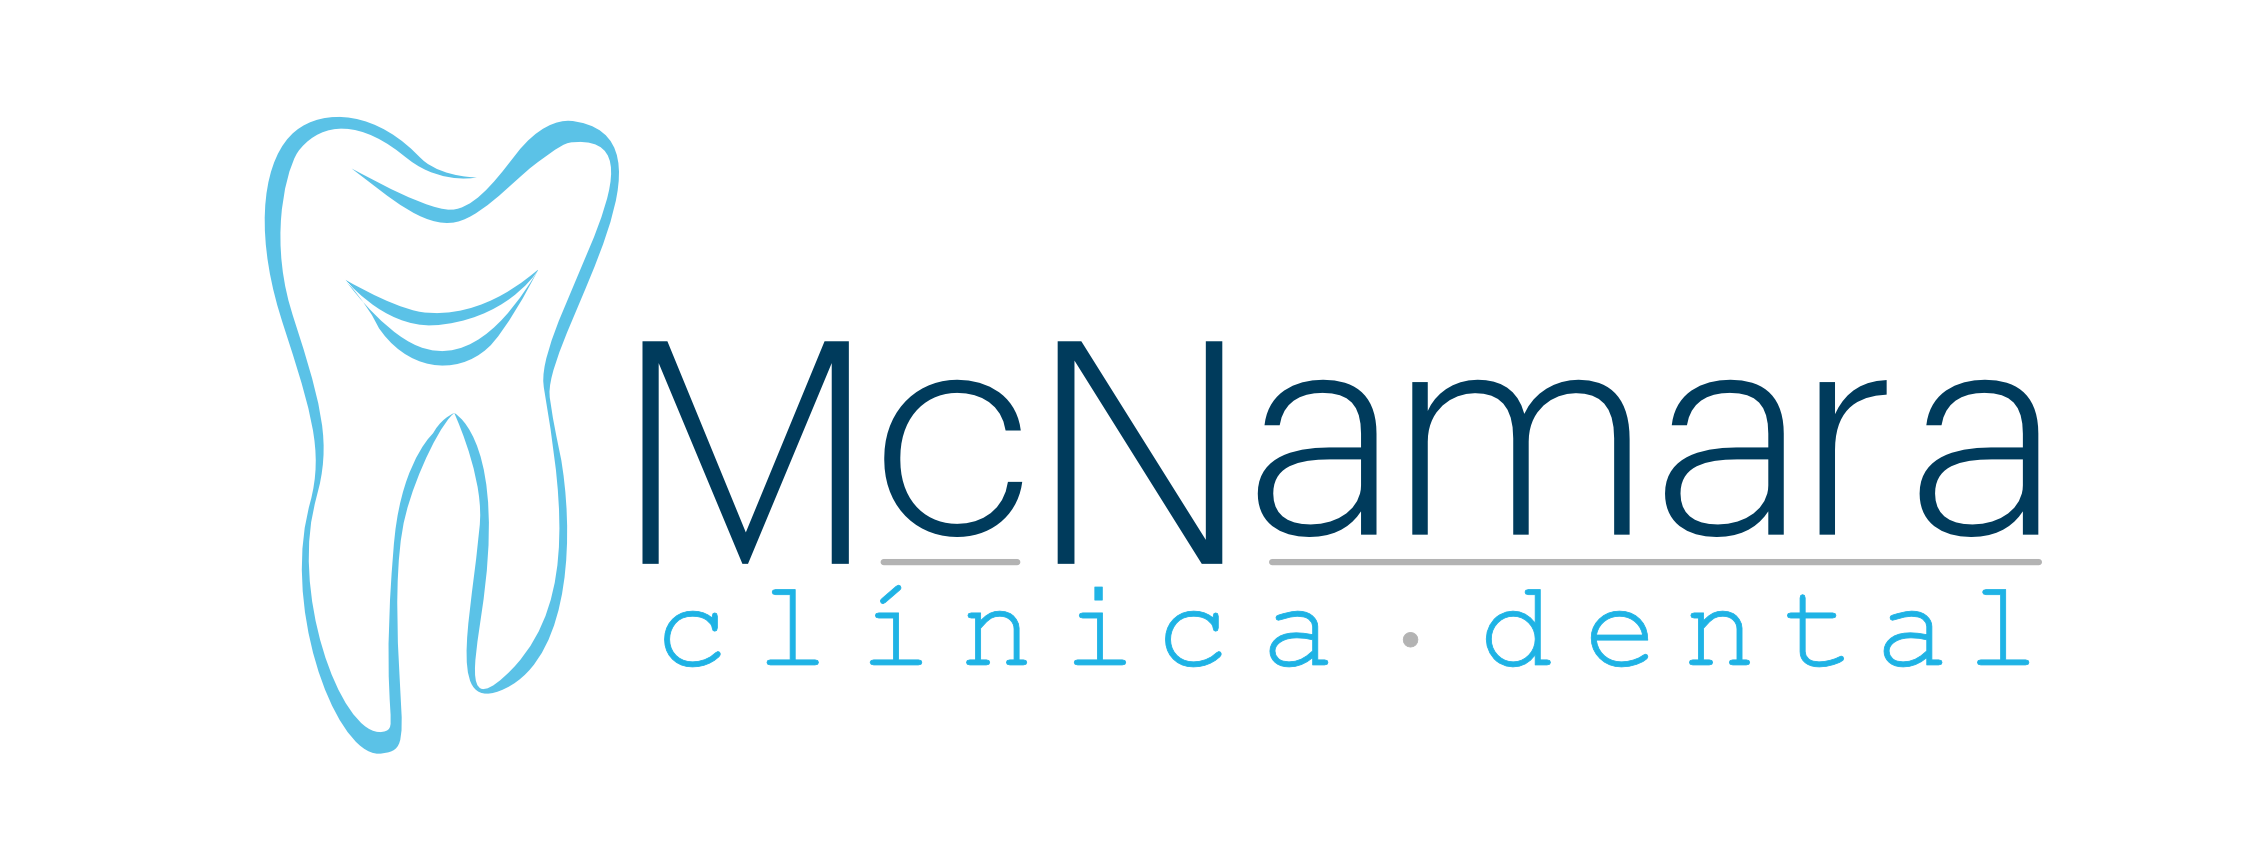 McNamara clinica dental